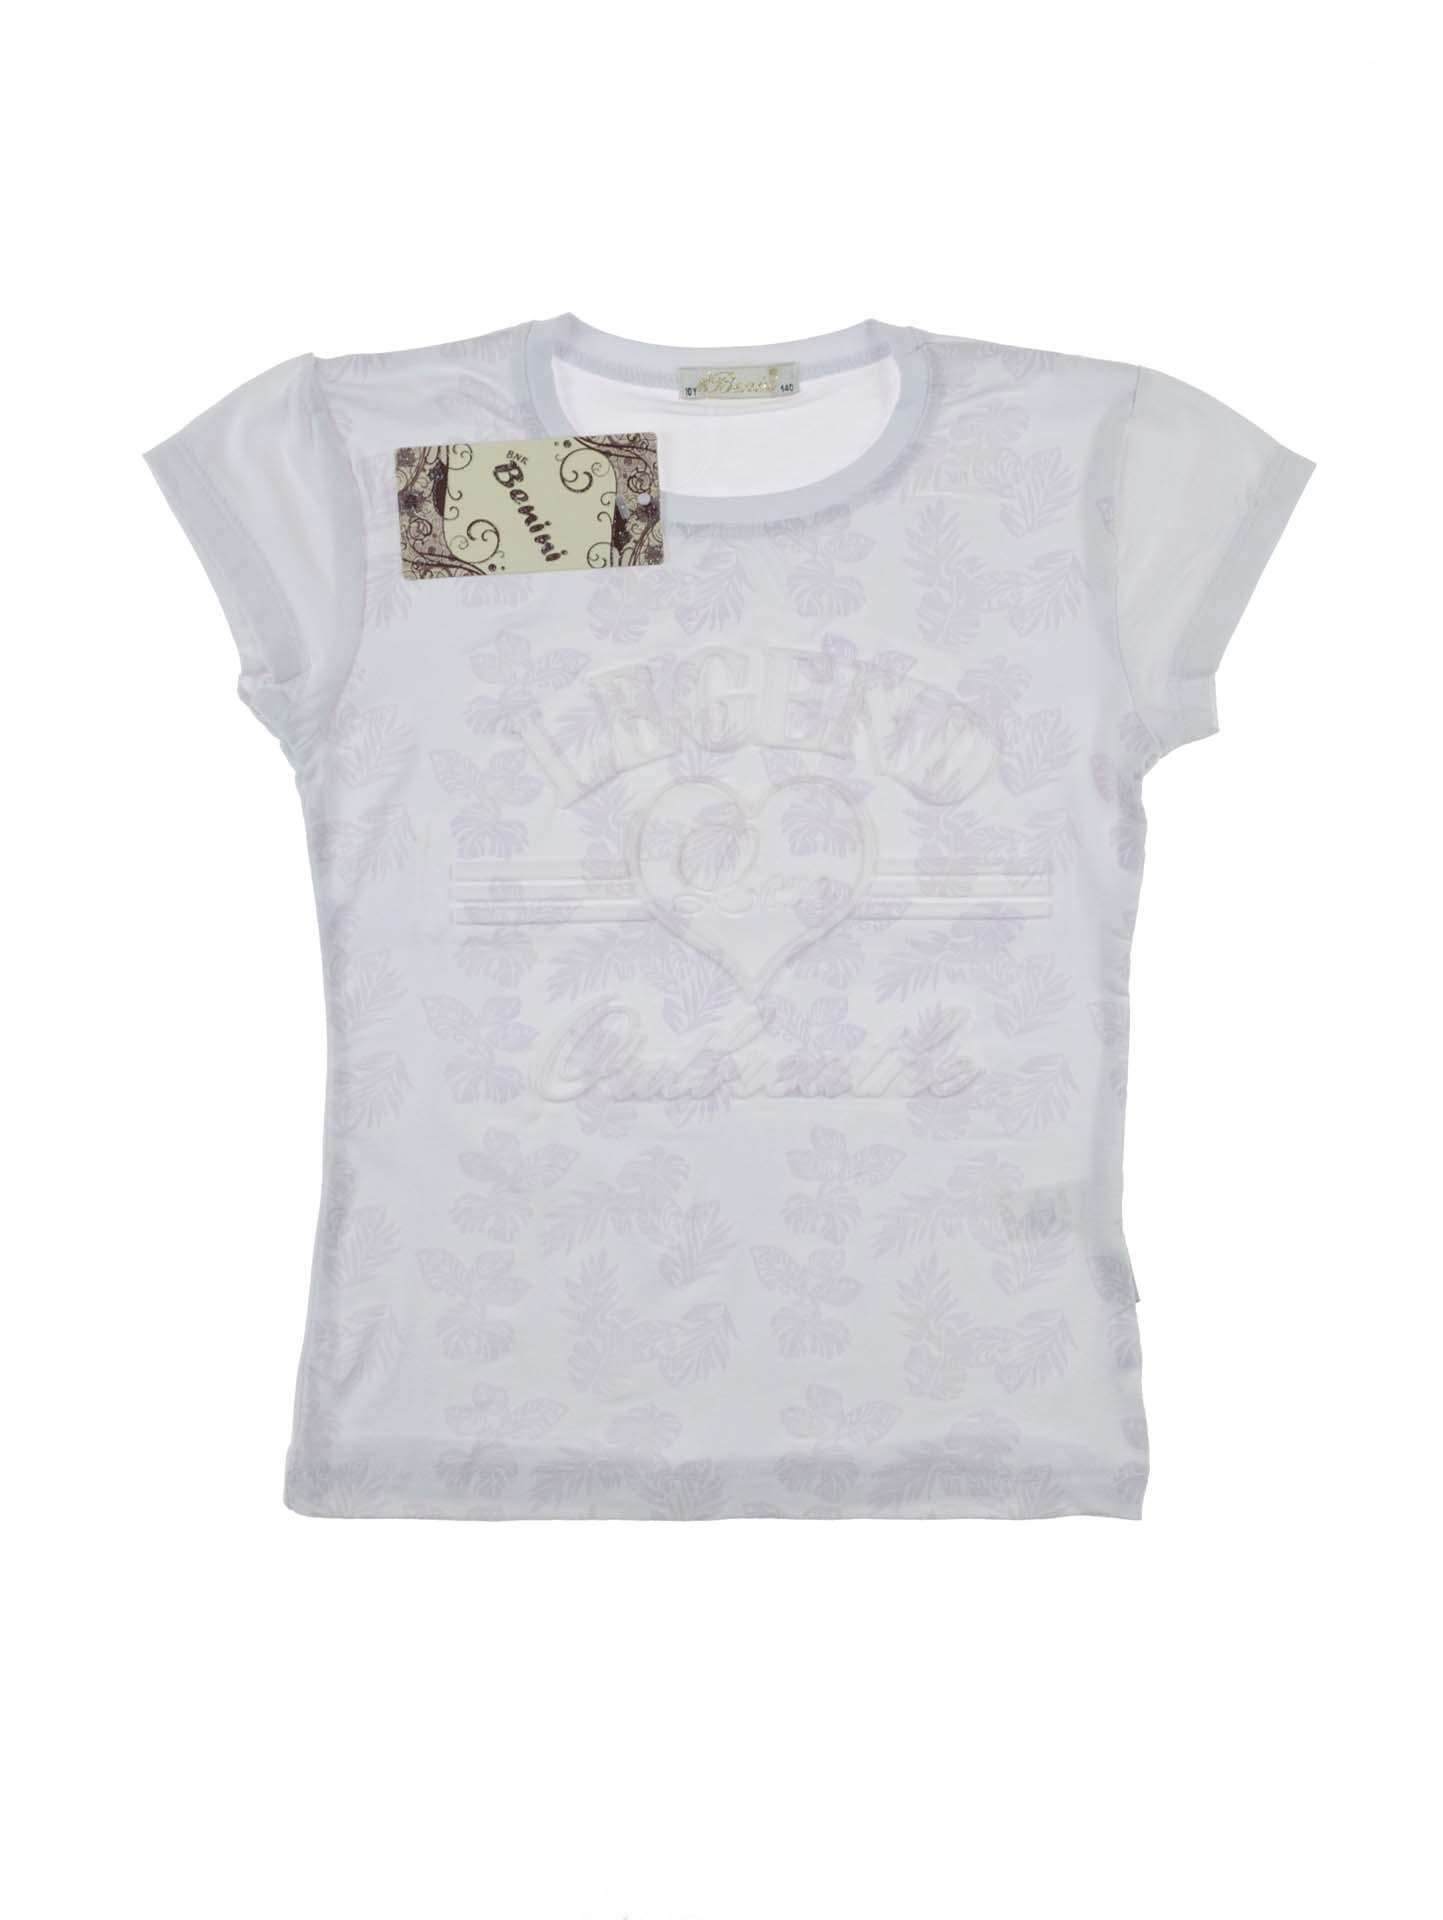 6279ff8e49e0 Купити Біла футболка для дівчинки Legend | Top Shelf | Інтернет ...